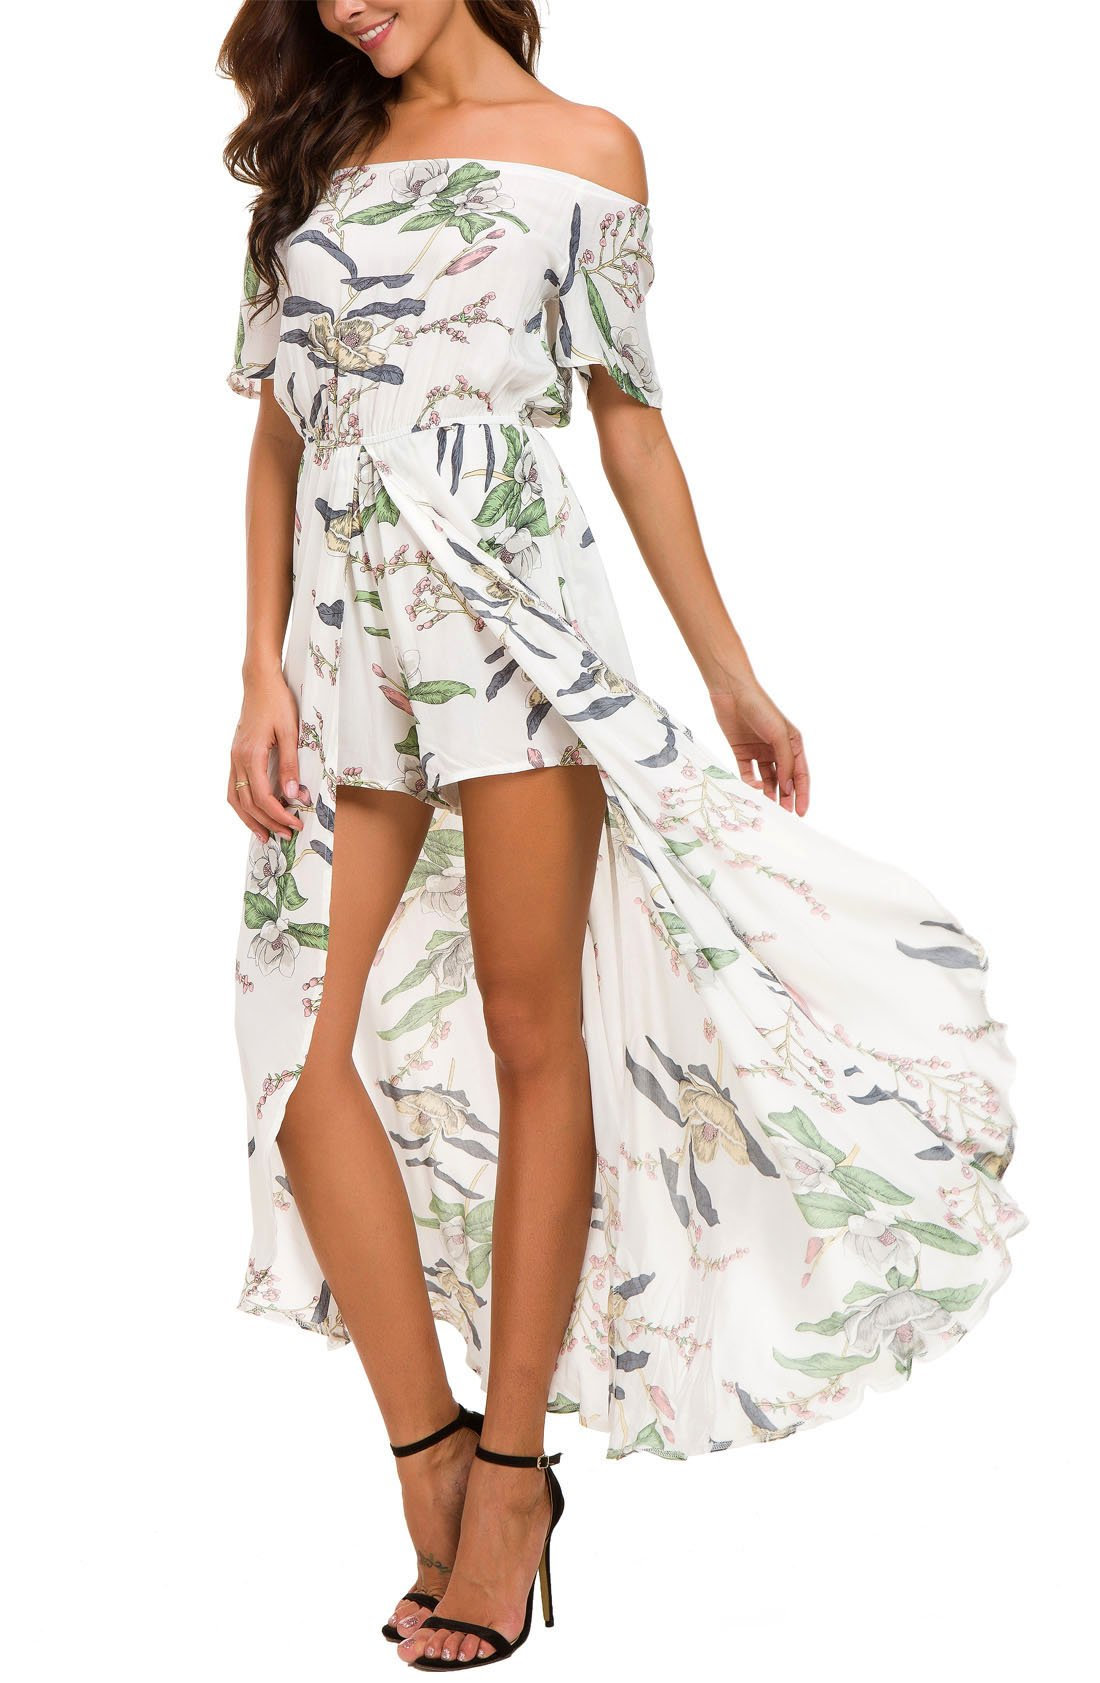 KorMei Womens Off Shoulder Short Sleeeve Floral Rayon Party Split Maxi Romper Dress XS White